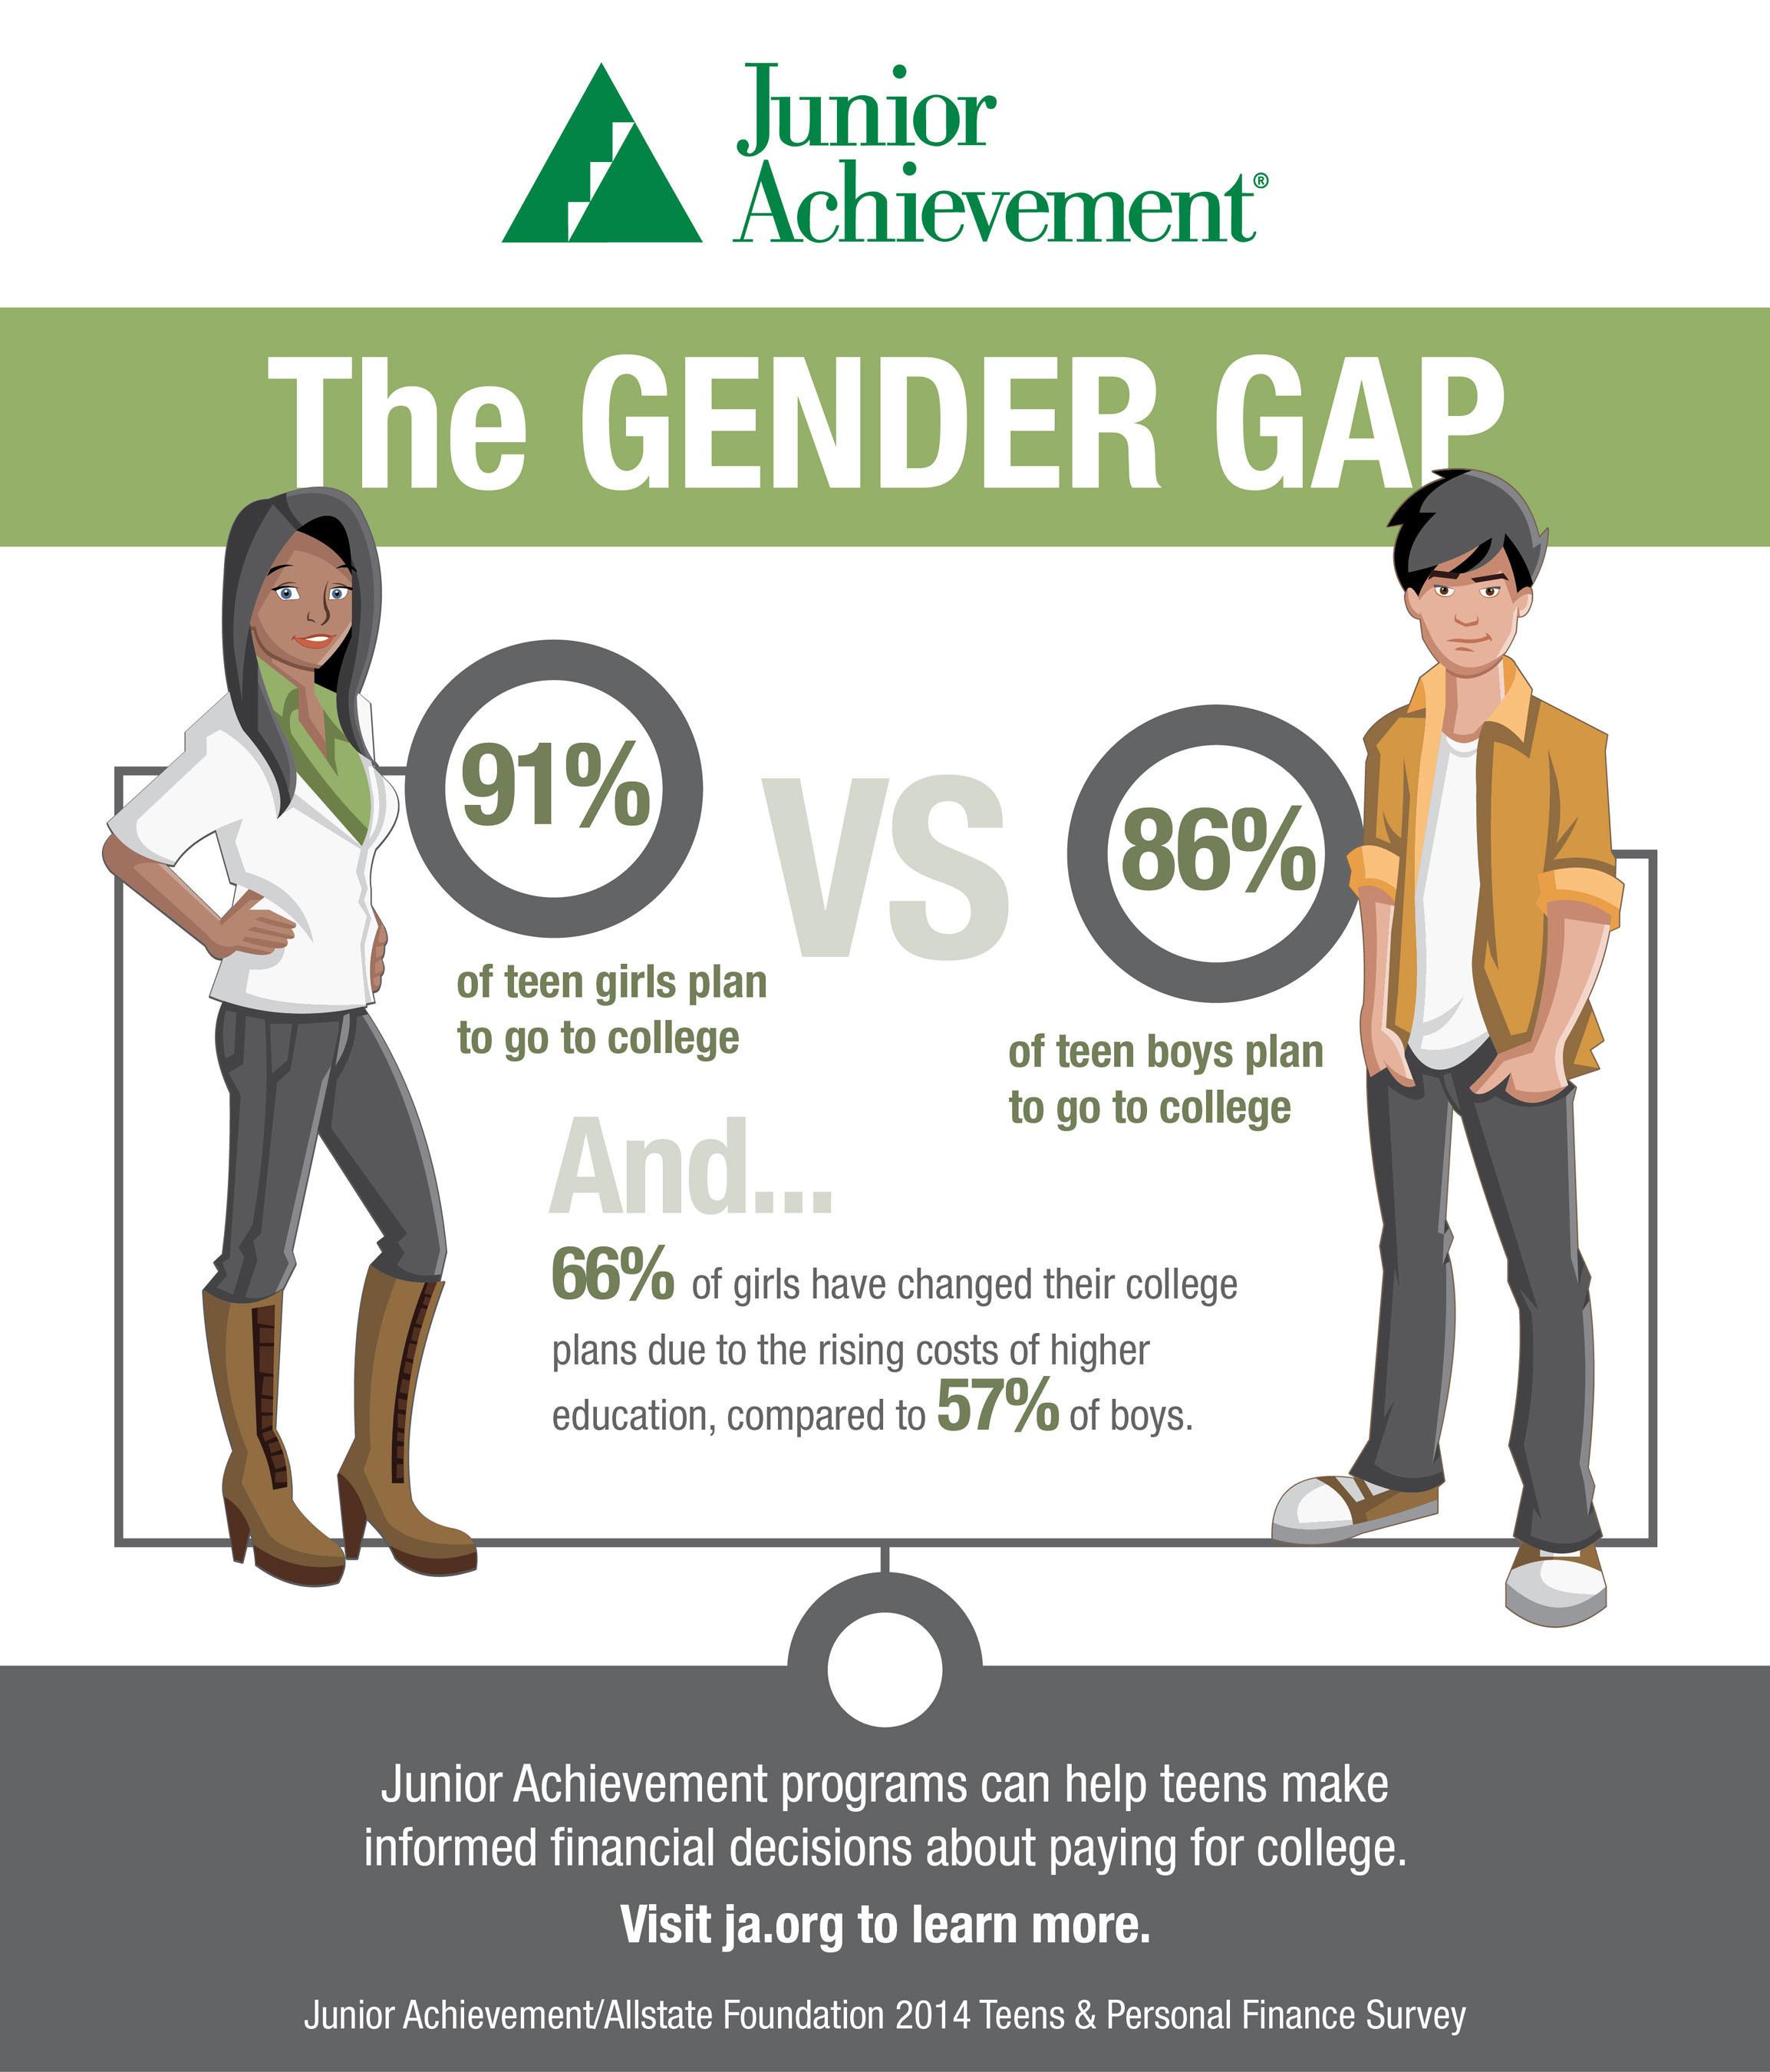 New Survey Reveals Gender Gap Among Teens Planning To Attend College. (PRNewsFoto/Junior Achievement USA) ...